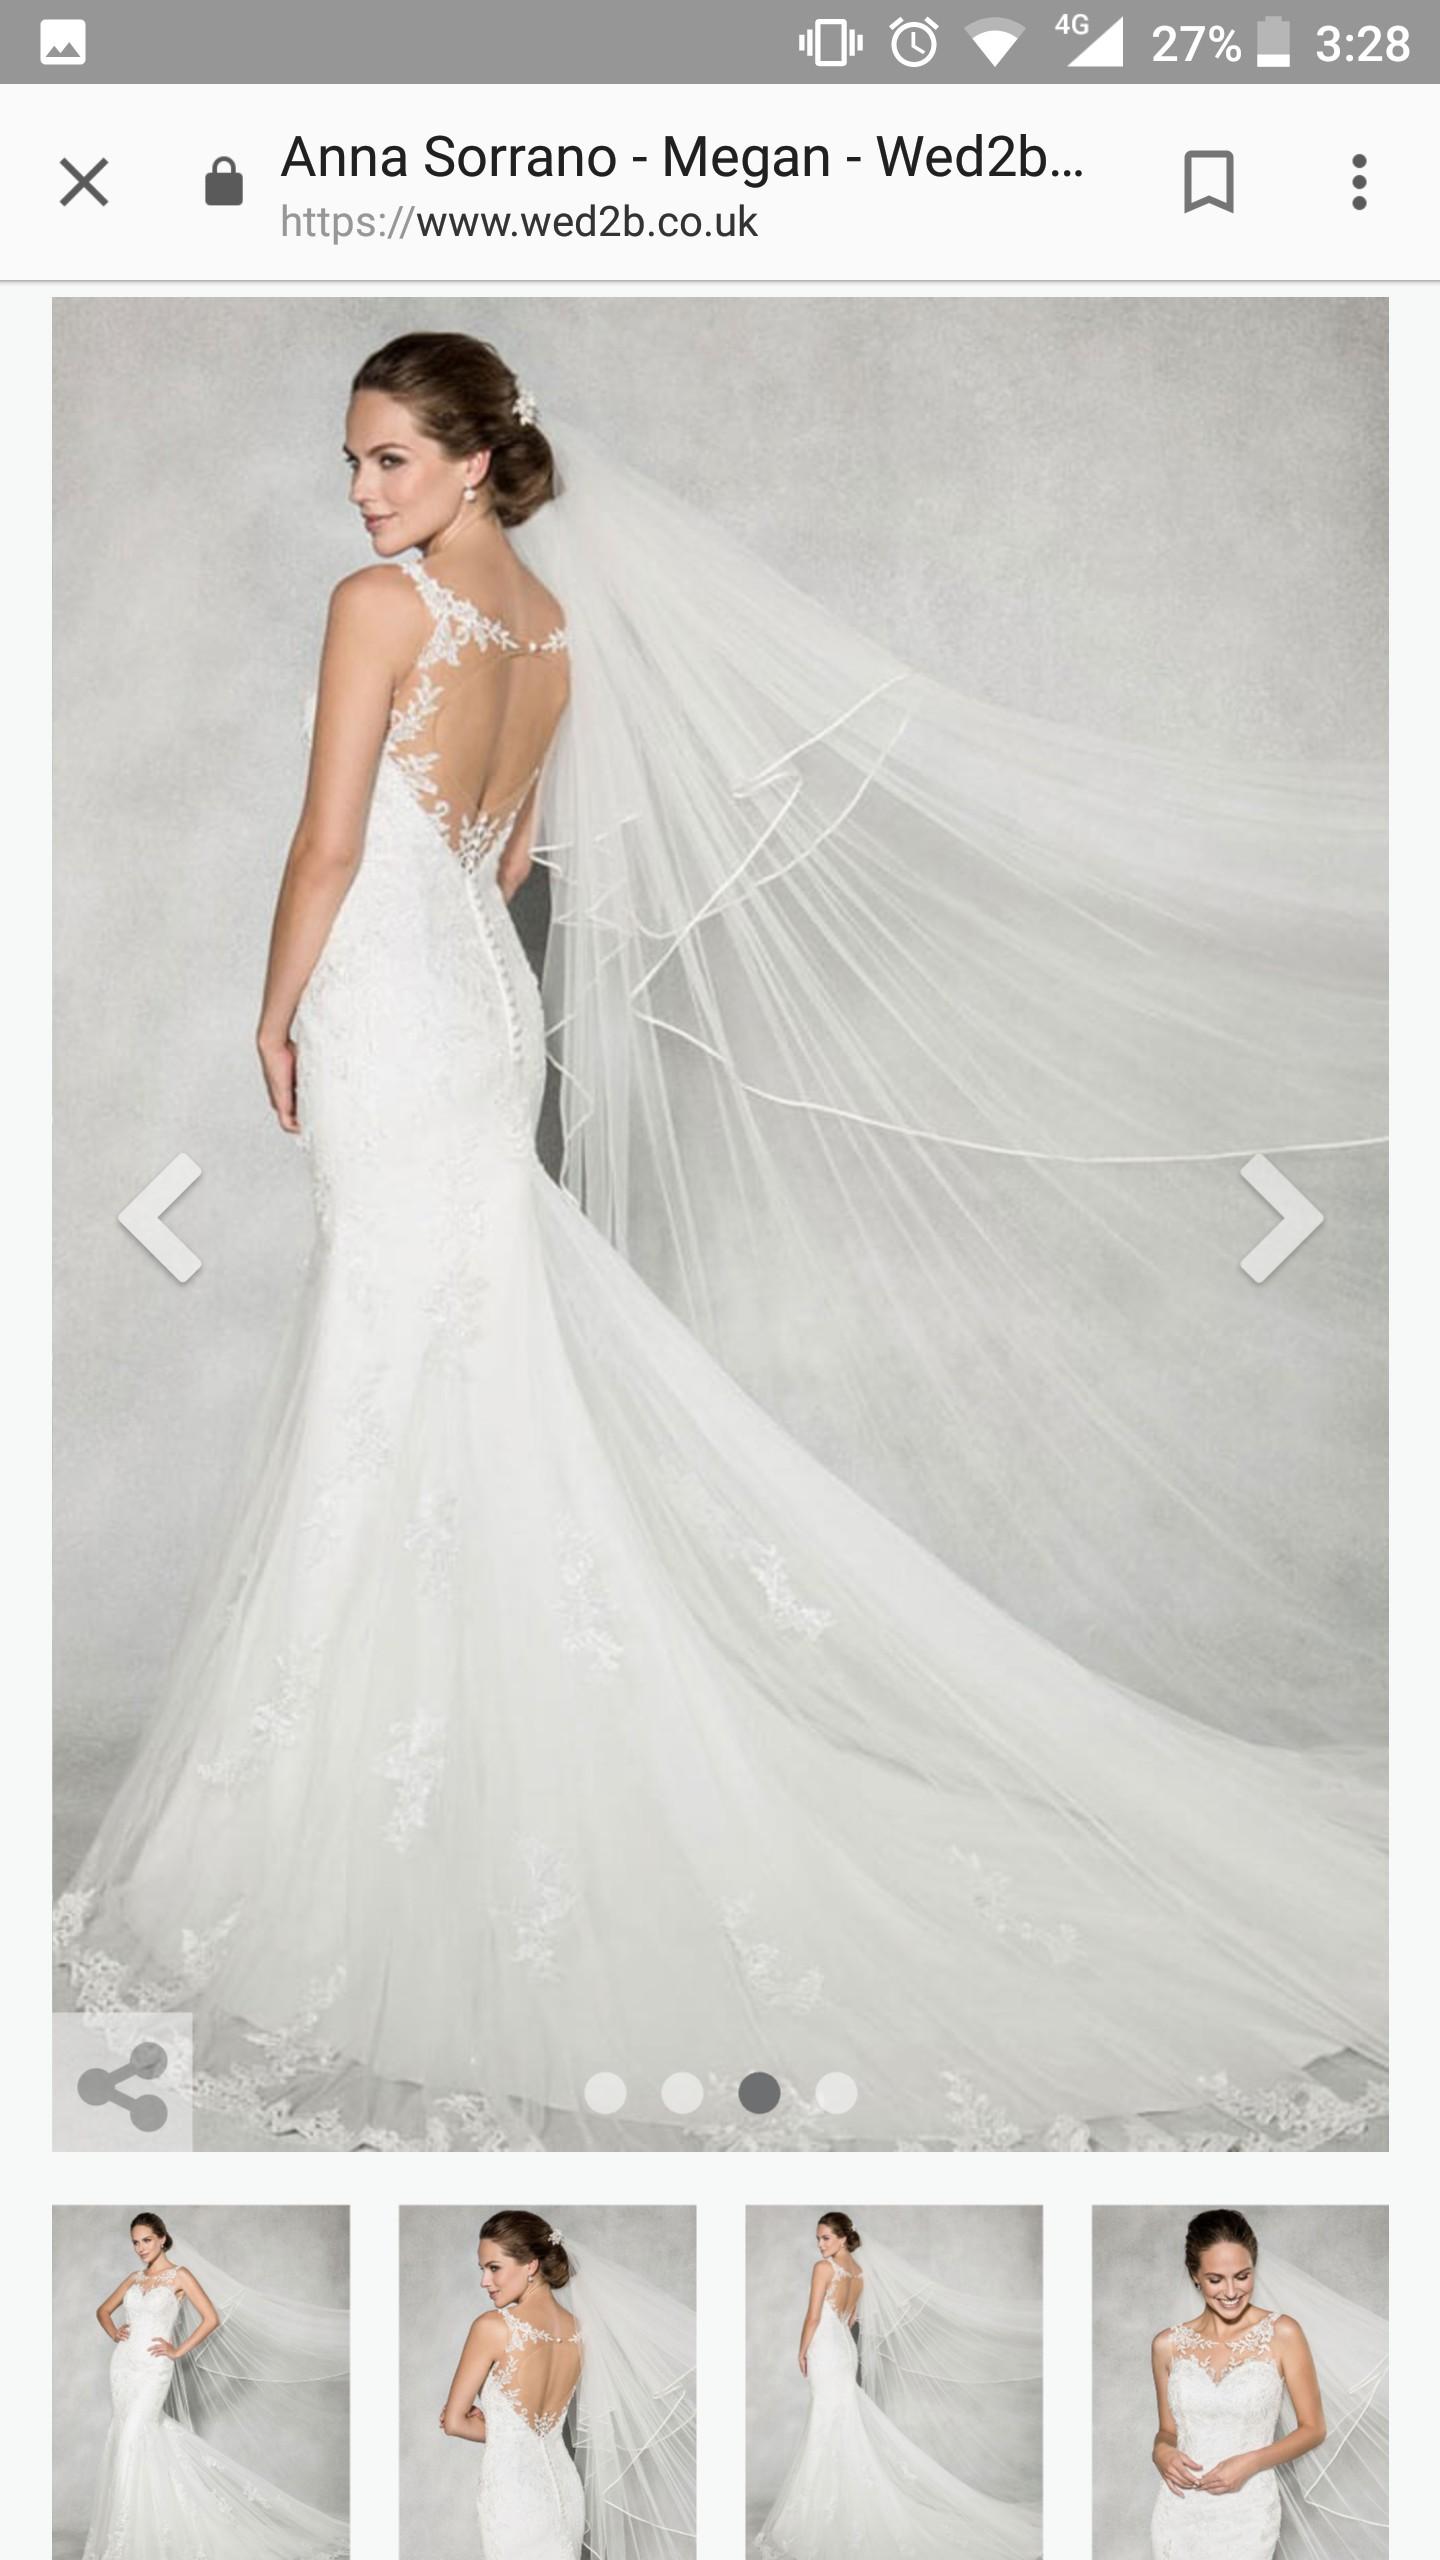 Who Designed Megan S Wedding Dress.Anna Sorrano Megan Wedding Dress On Sale 35 Off